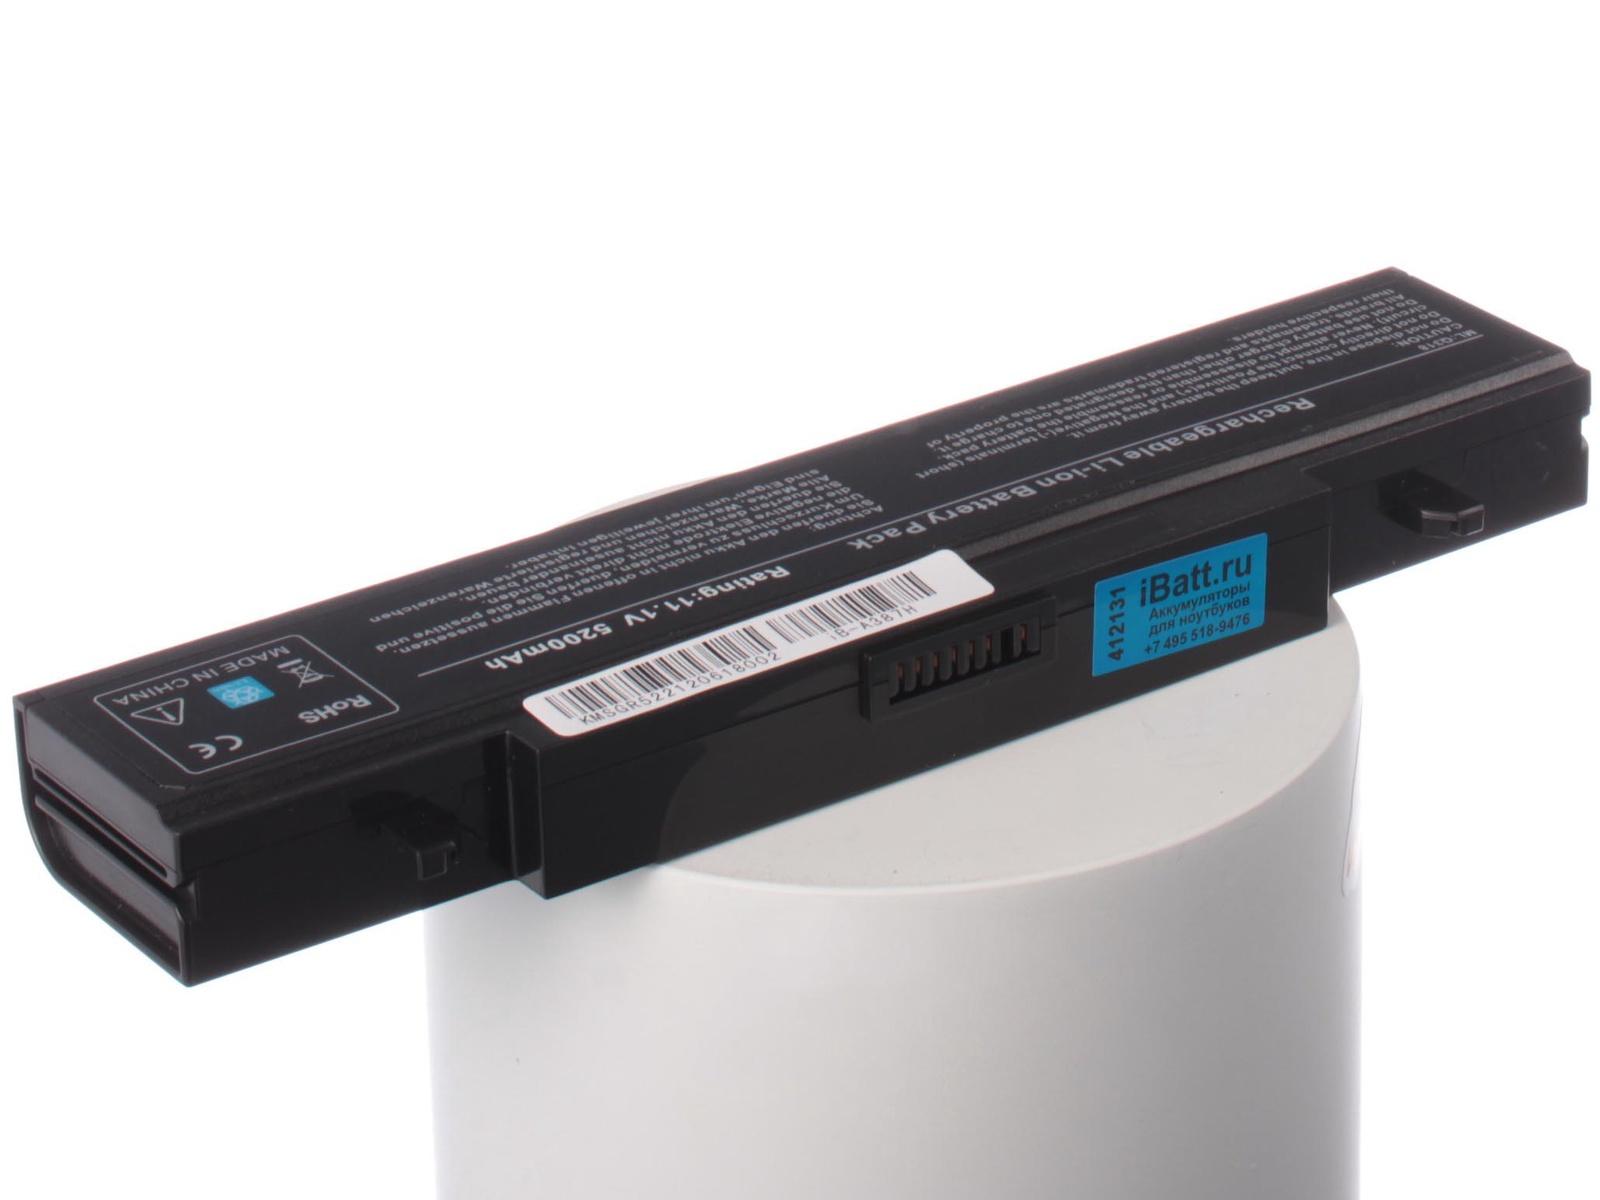 Аккумулятор для ноутбука iBatt для Samsung RV711-A01, 300E5X-U02, 300V5A-S0E, 305V5A-T09, 310E5C-U05, 350E7C-A04, R430-JA01, R780-JS02, RF712-S01, 300E5C-A0E, 300E5Z-S01, NP270E5E-K02, R469-JS01, R525-JT05, R540-JS01, R580-JS04 аккумулятор для ноутбука anybatt для samsung rv711 a01 300e5x u02 300v5a s0e 305v5a t09 310e5c u05 350e7c a04 r430 ja01 r780 js02 rf712 s01 300e5c a0e 300e5z s01 np270e5e k02 r469 js01 r525 jt05 r540 js01 r580 js04